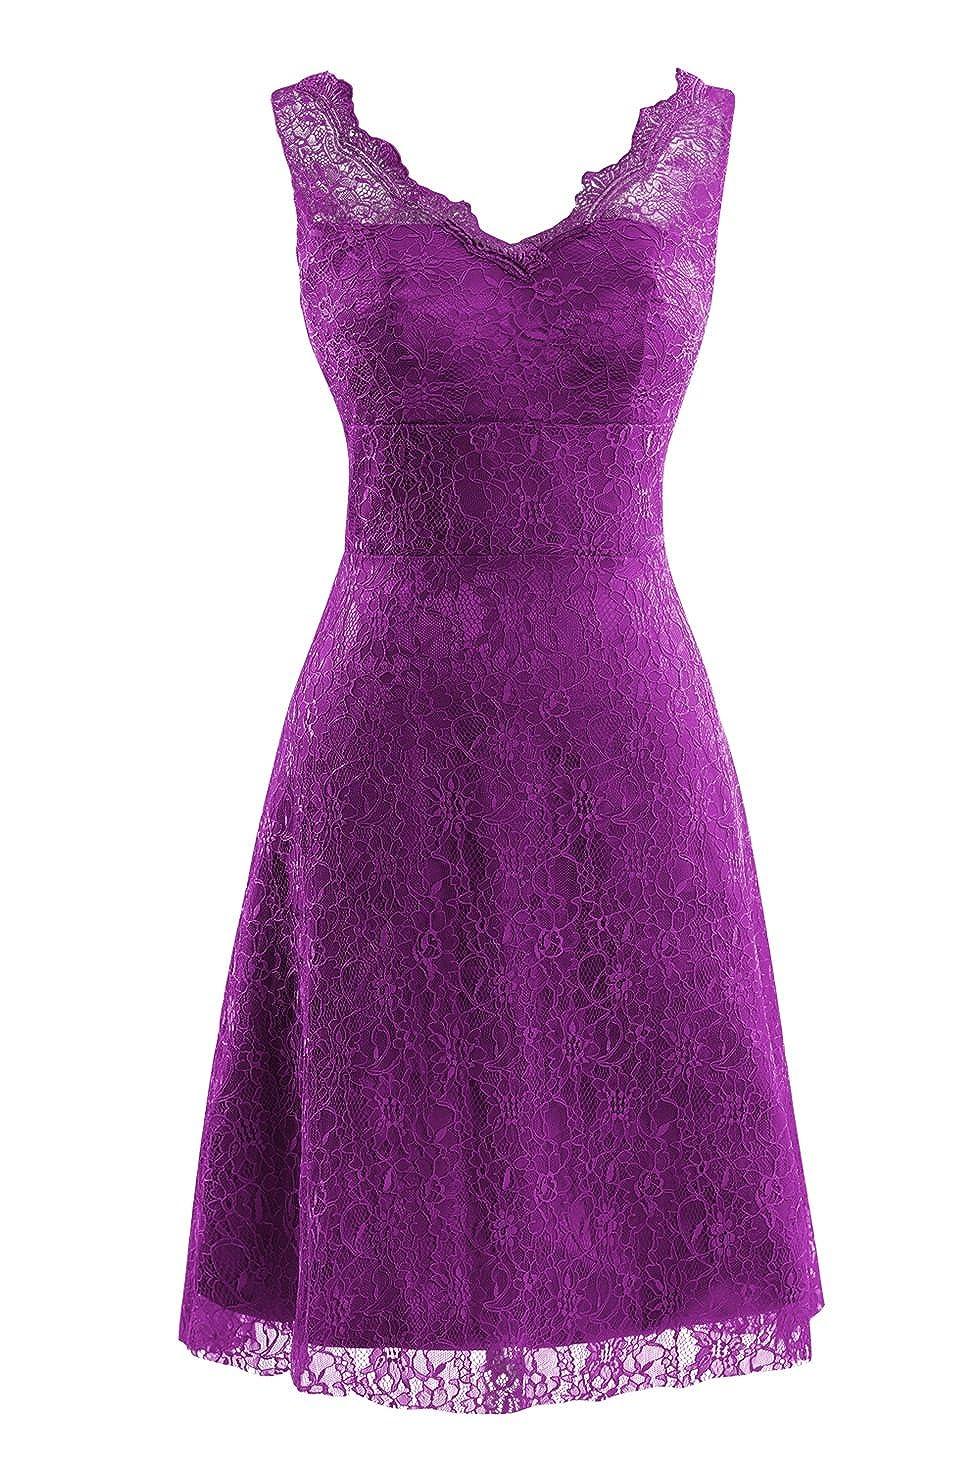 Grape Bess Bridal Women's V Neck Lace Knee Length Prom Party Dresses